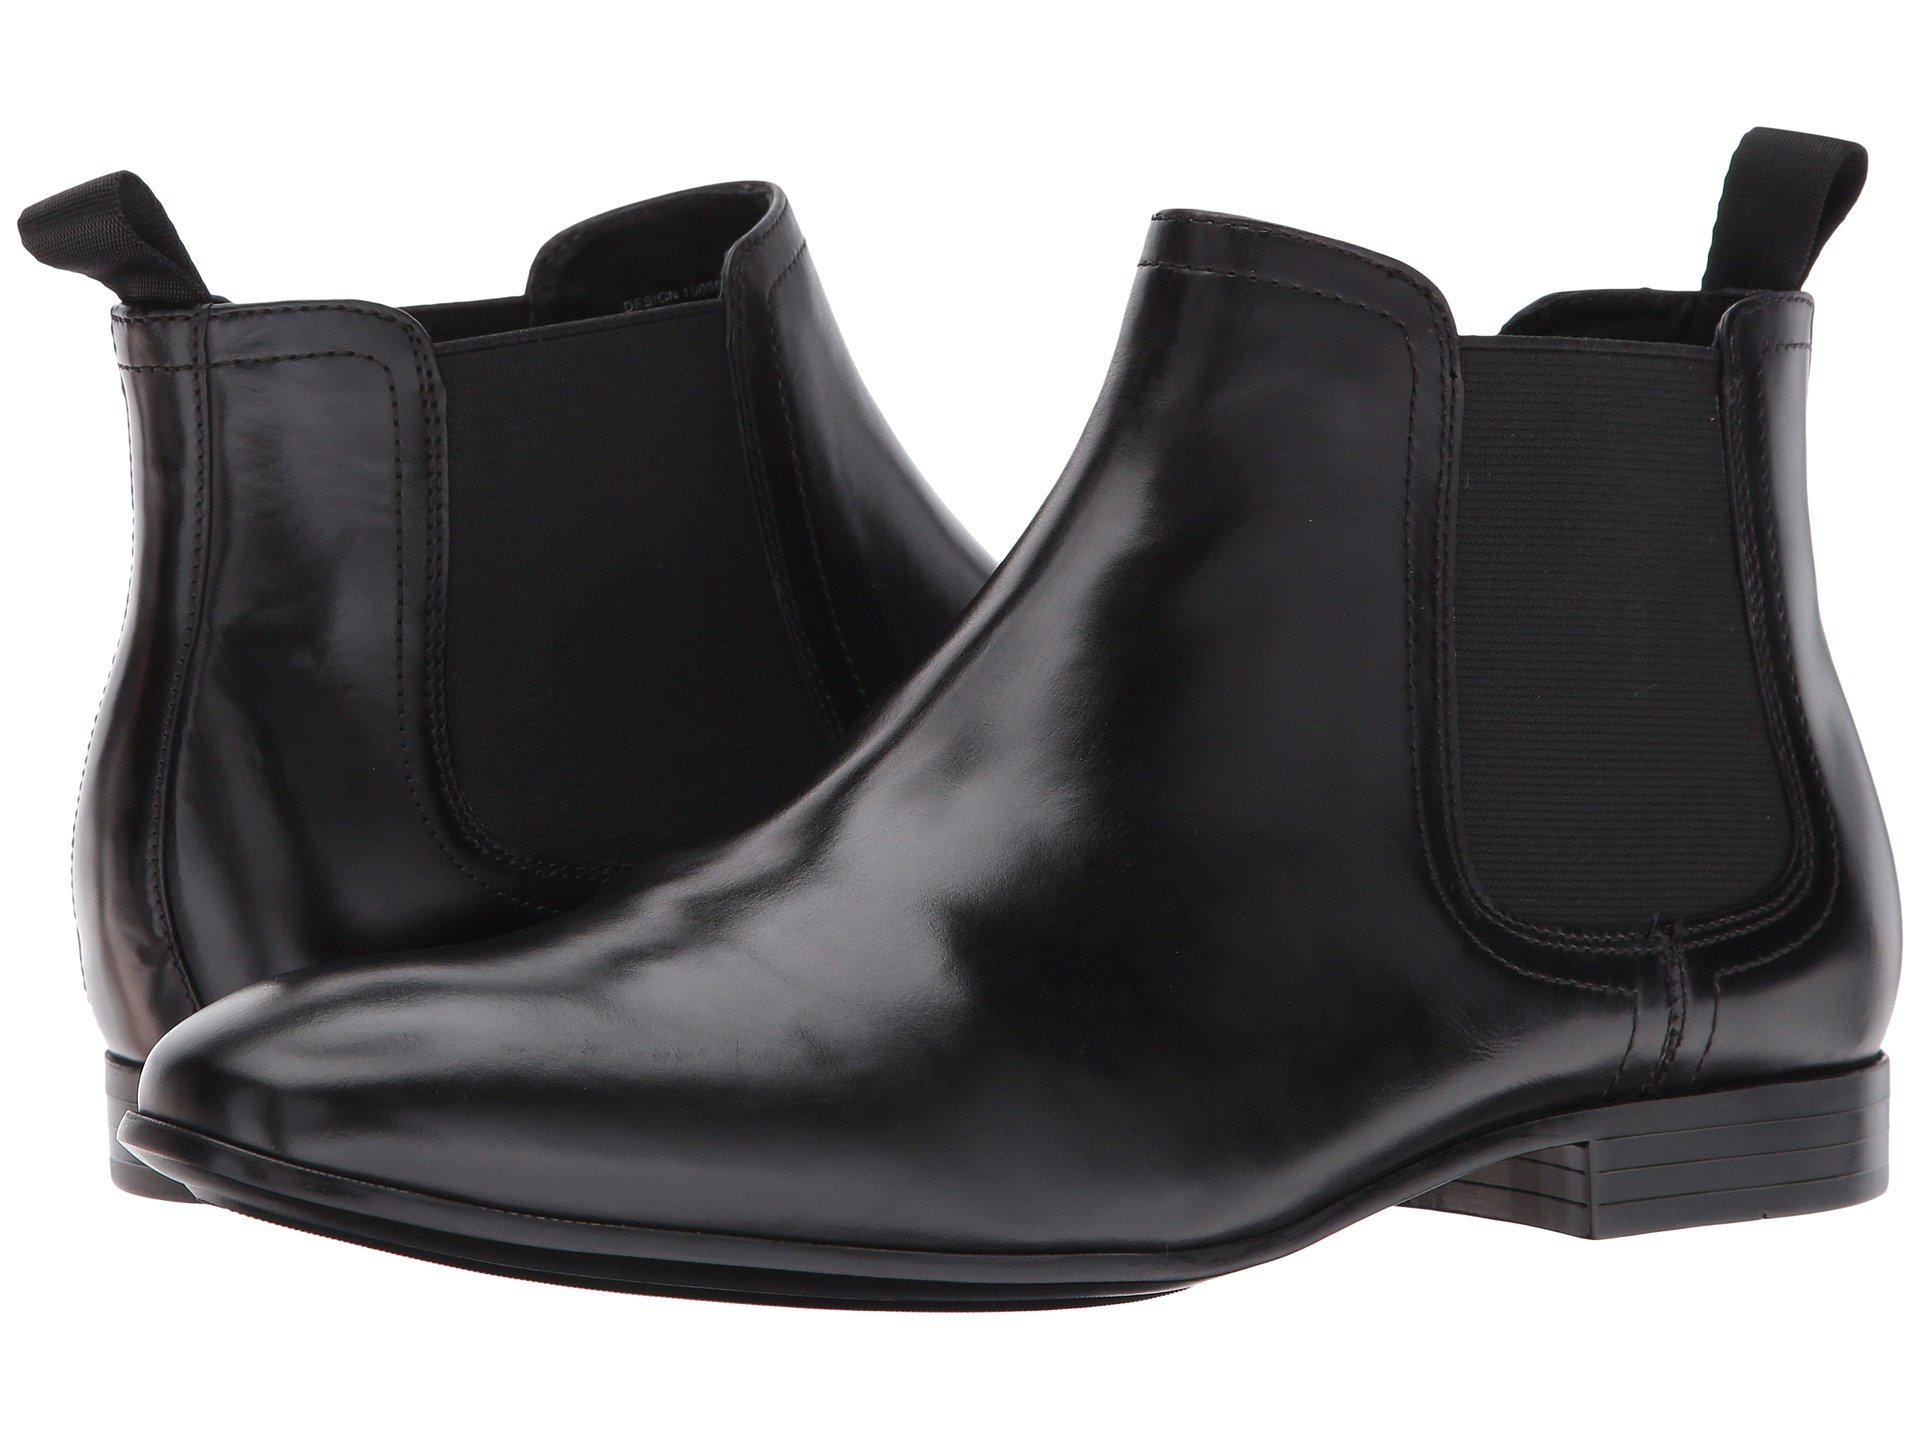 6a5073c71a2c Lyst - Kenneth Cole Design 10055 (black) Men s Shoes in Black for Men